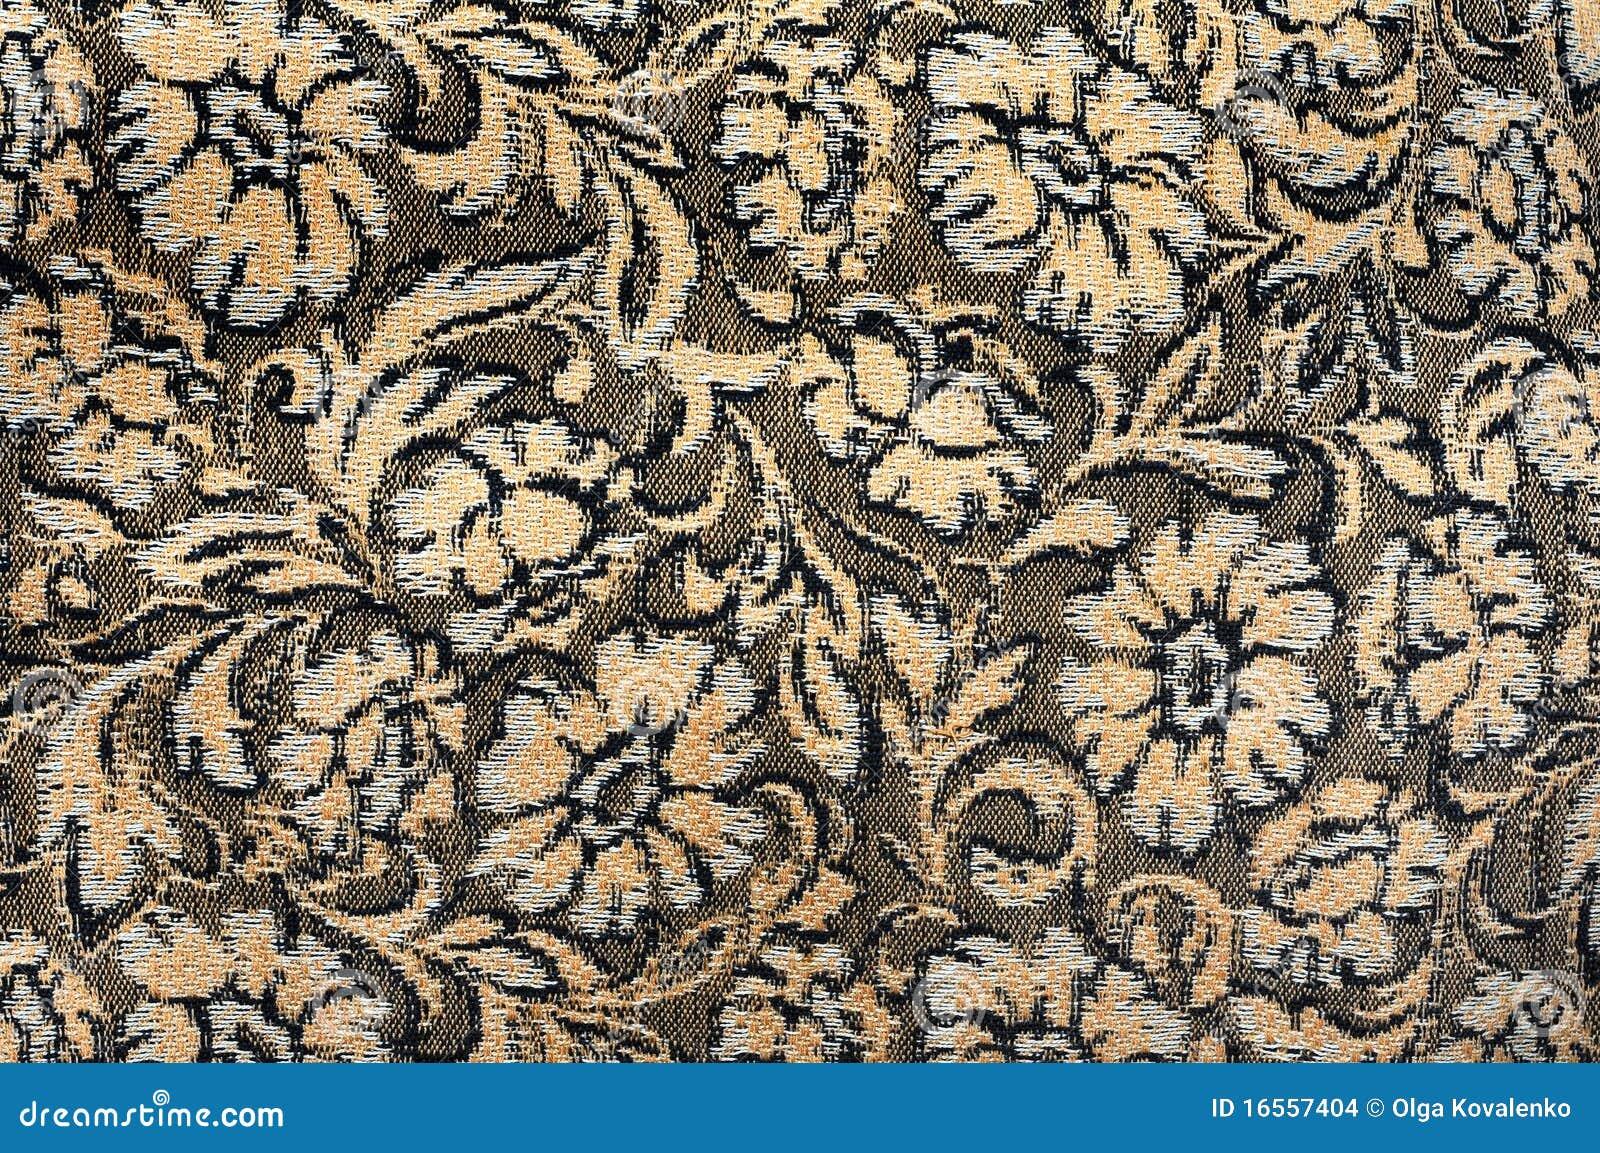 New embroidery cloth texture makaroka